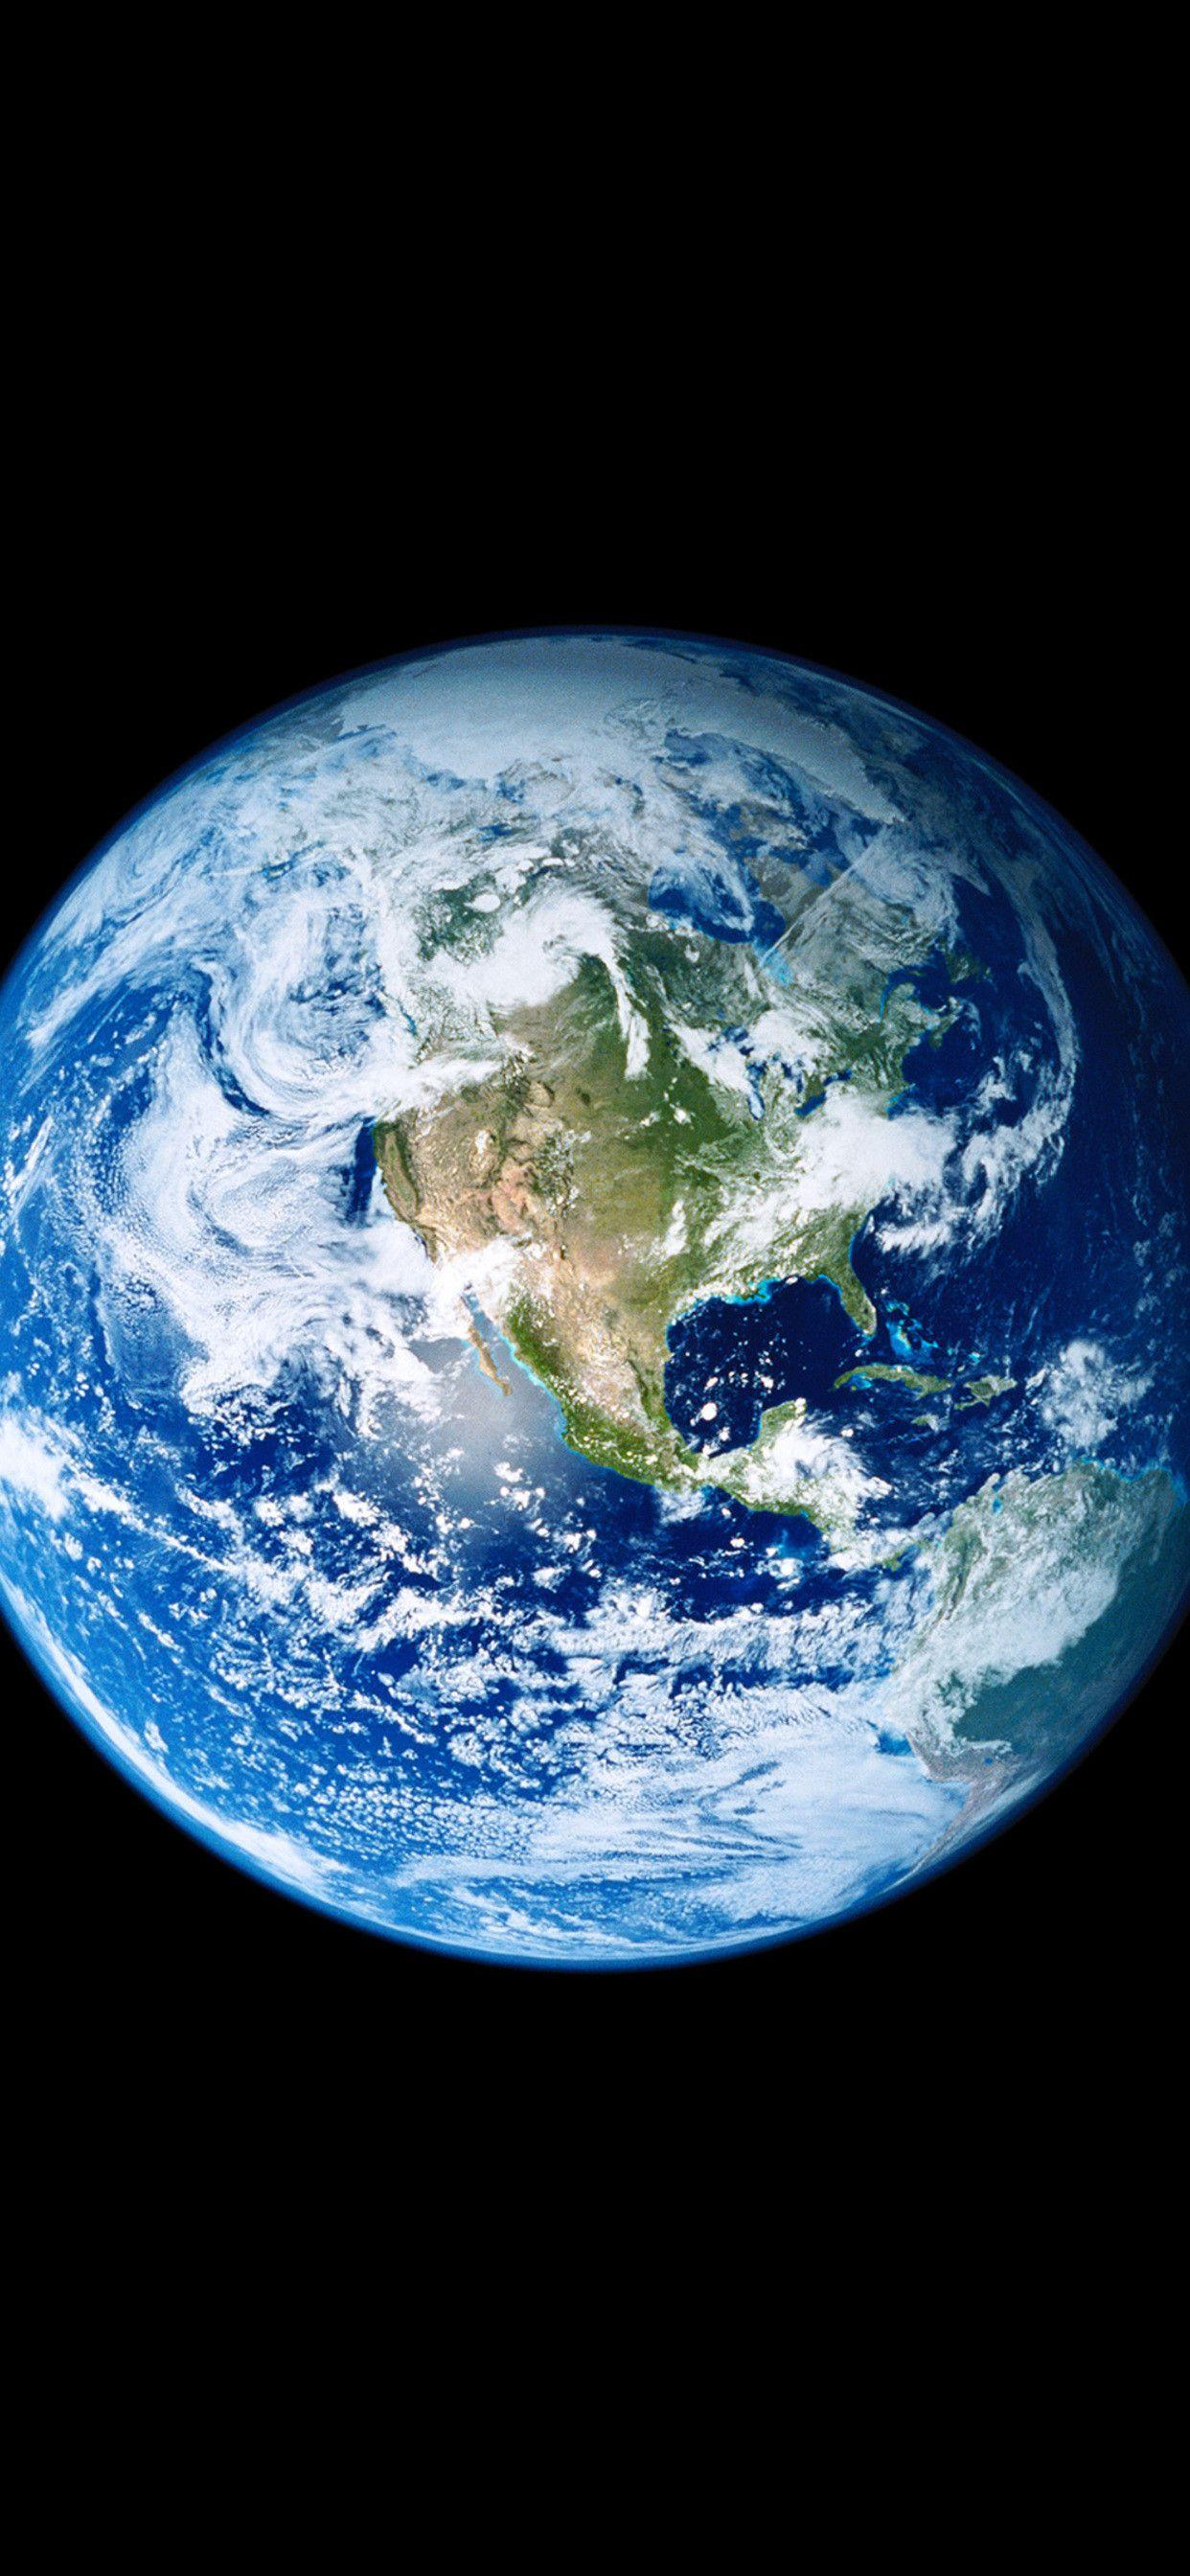 Best Of 4k Resolution Iphone 11 Wallpaper Hd Images Iphone Wallpaper Earth Earth Wallpapers Ios 11 Wallpaper